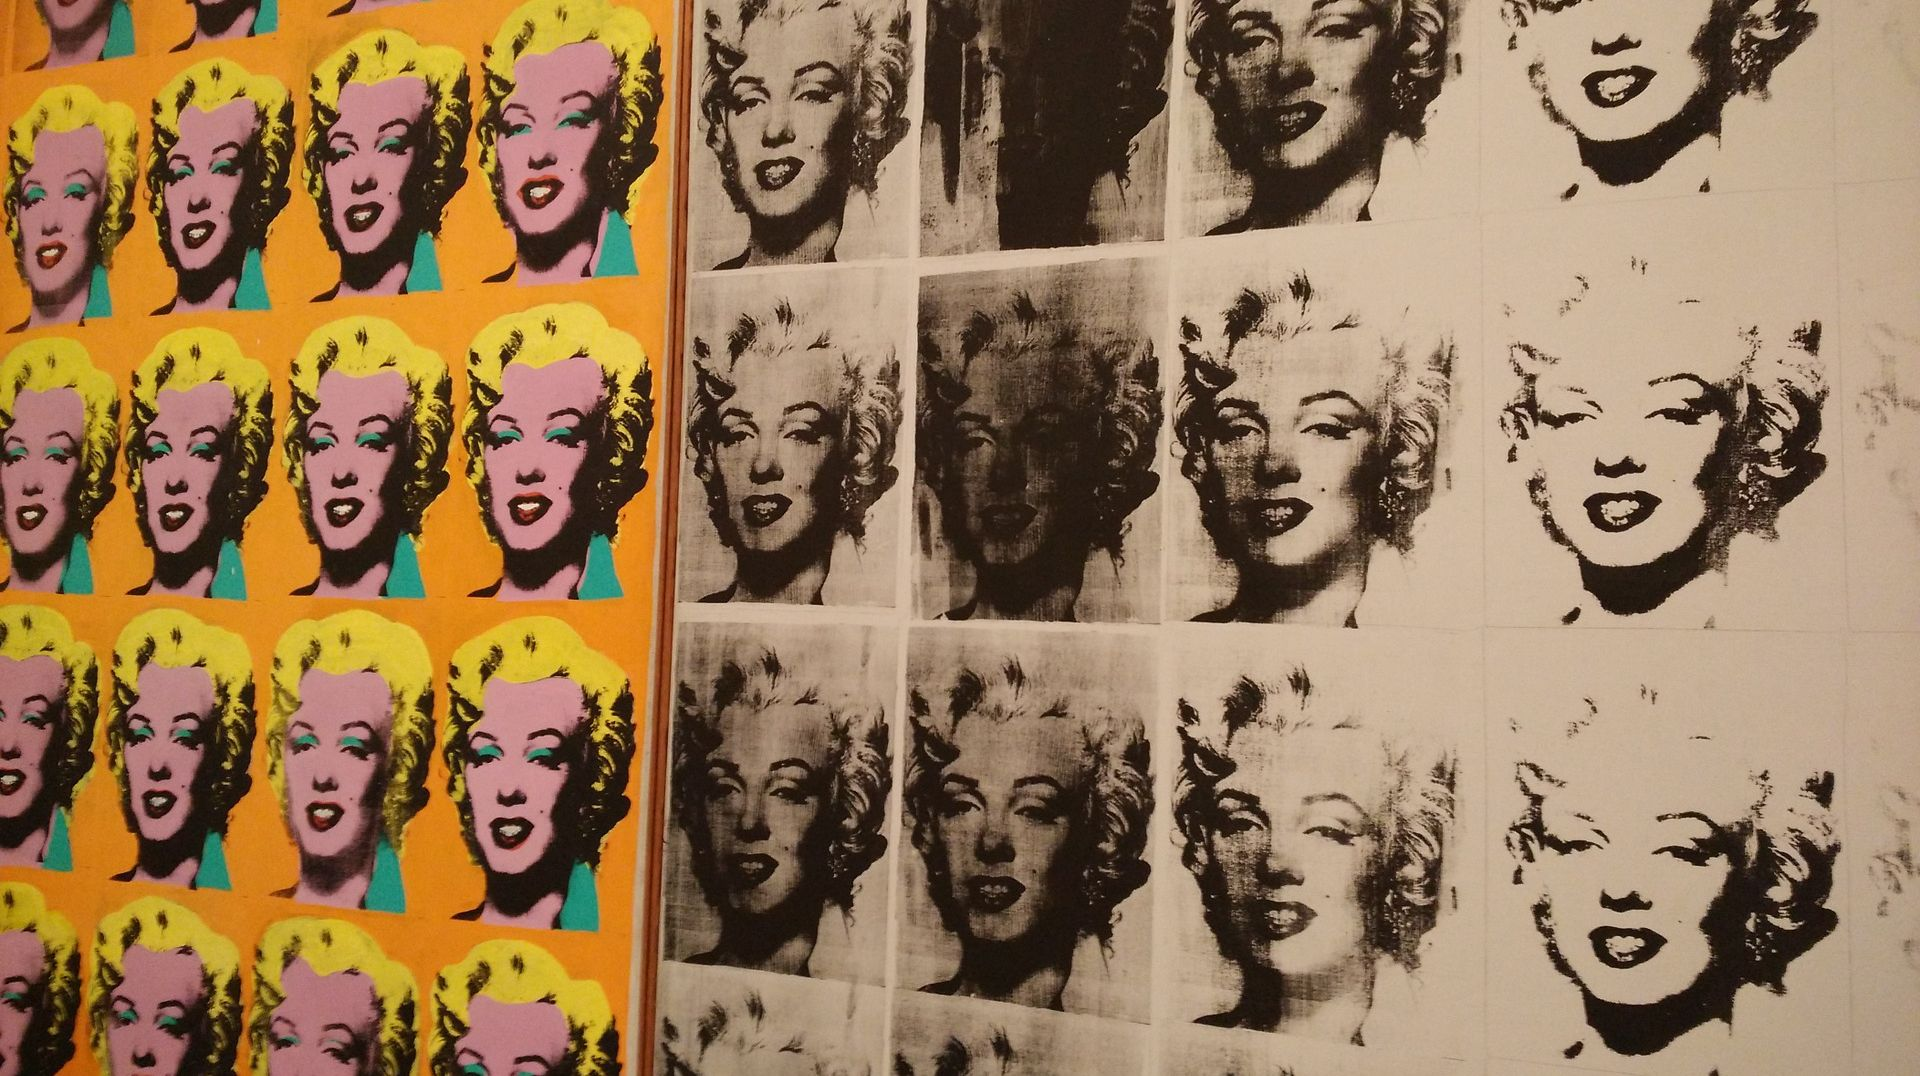 Retrospektivna izložba Warhola u muzeju Whitney